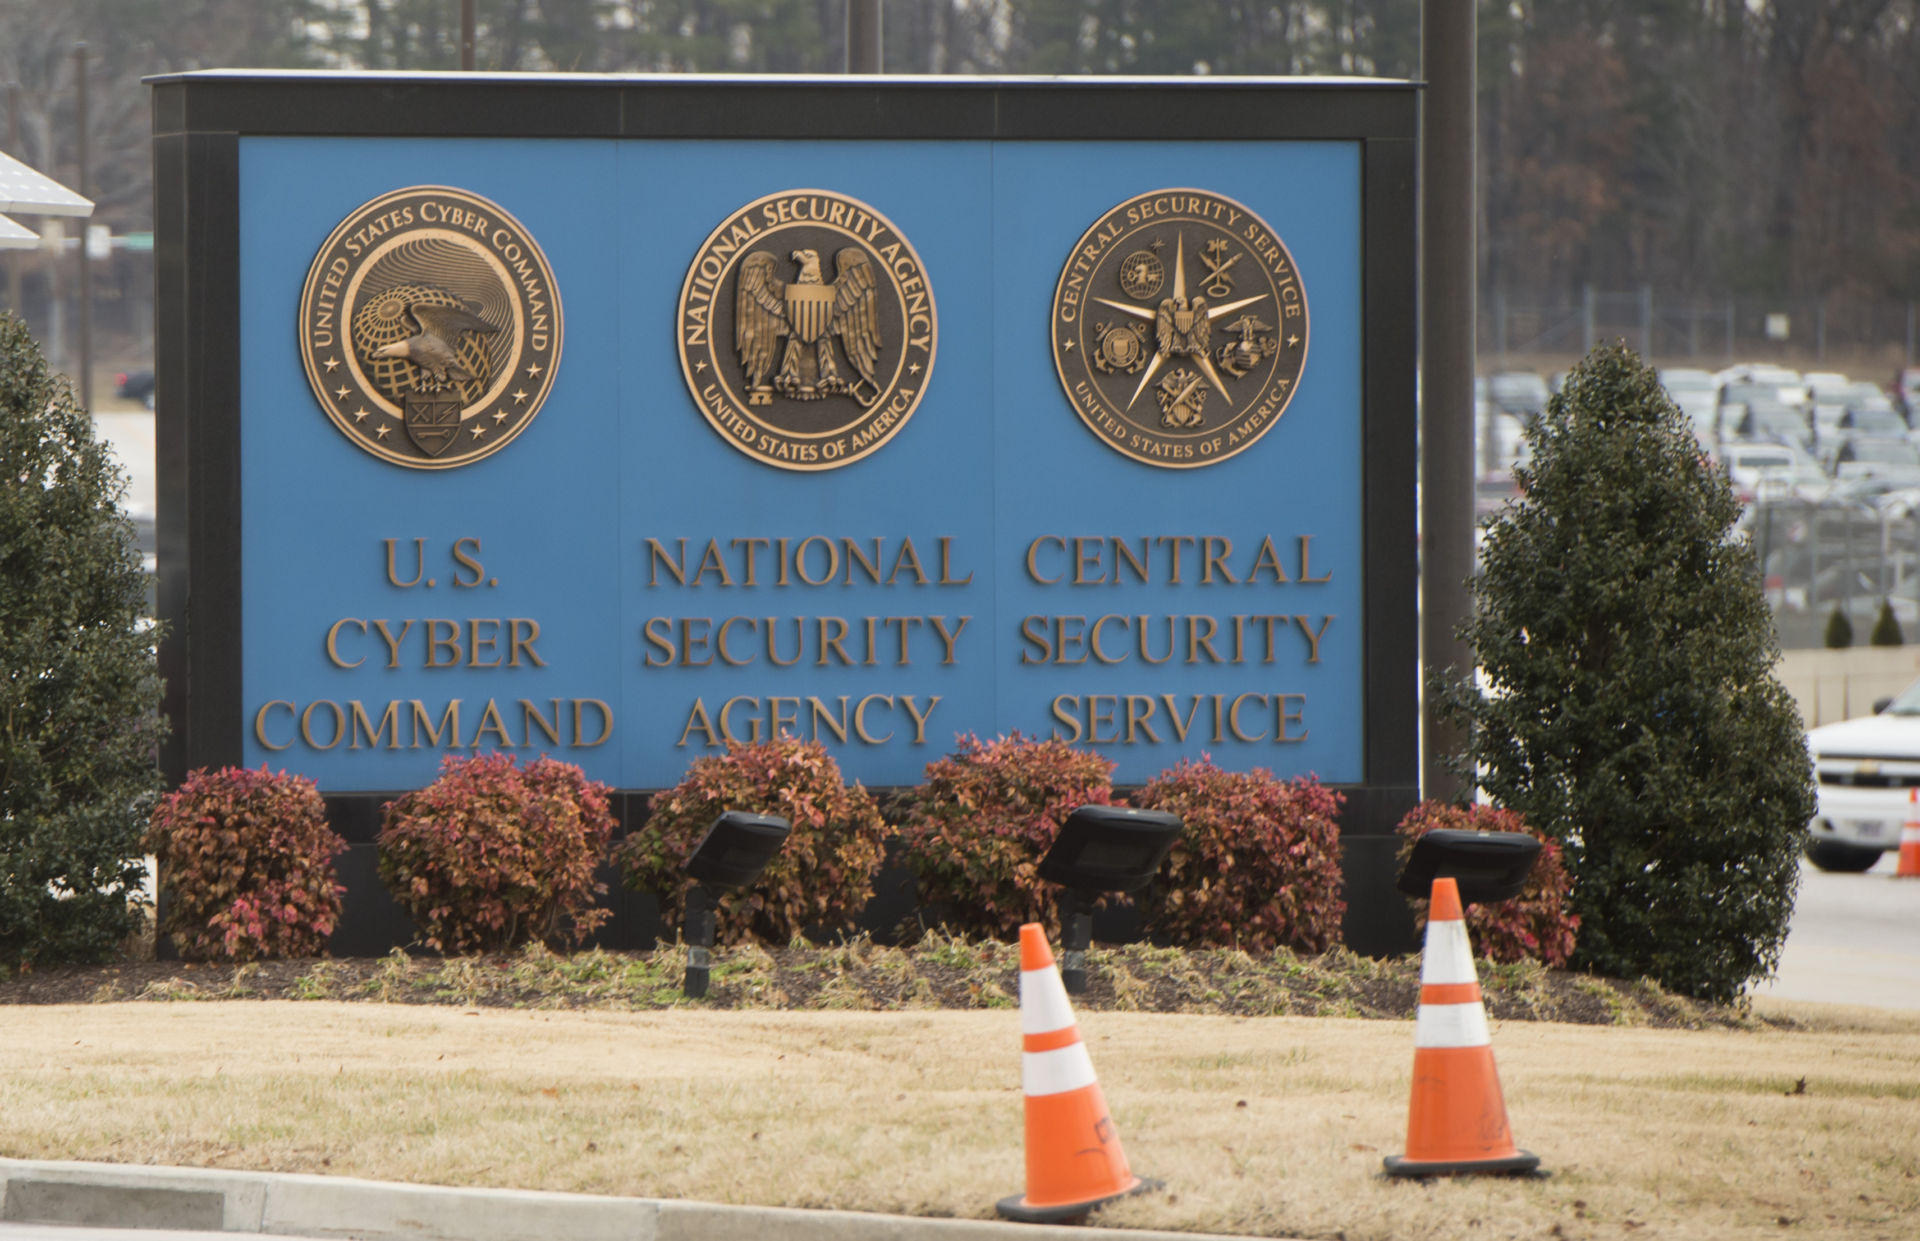 TS-NSA-051521